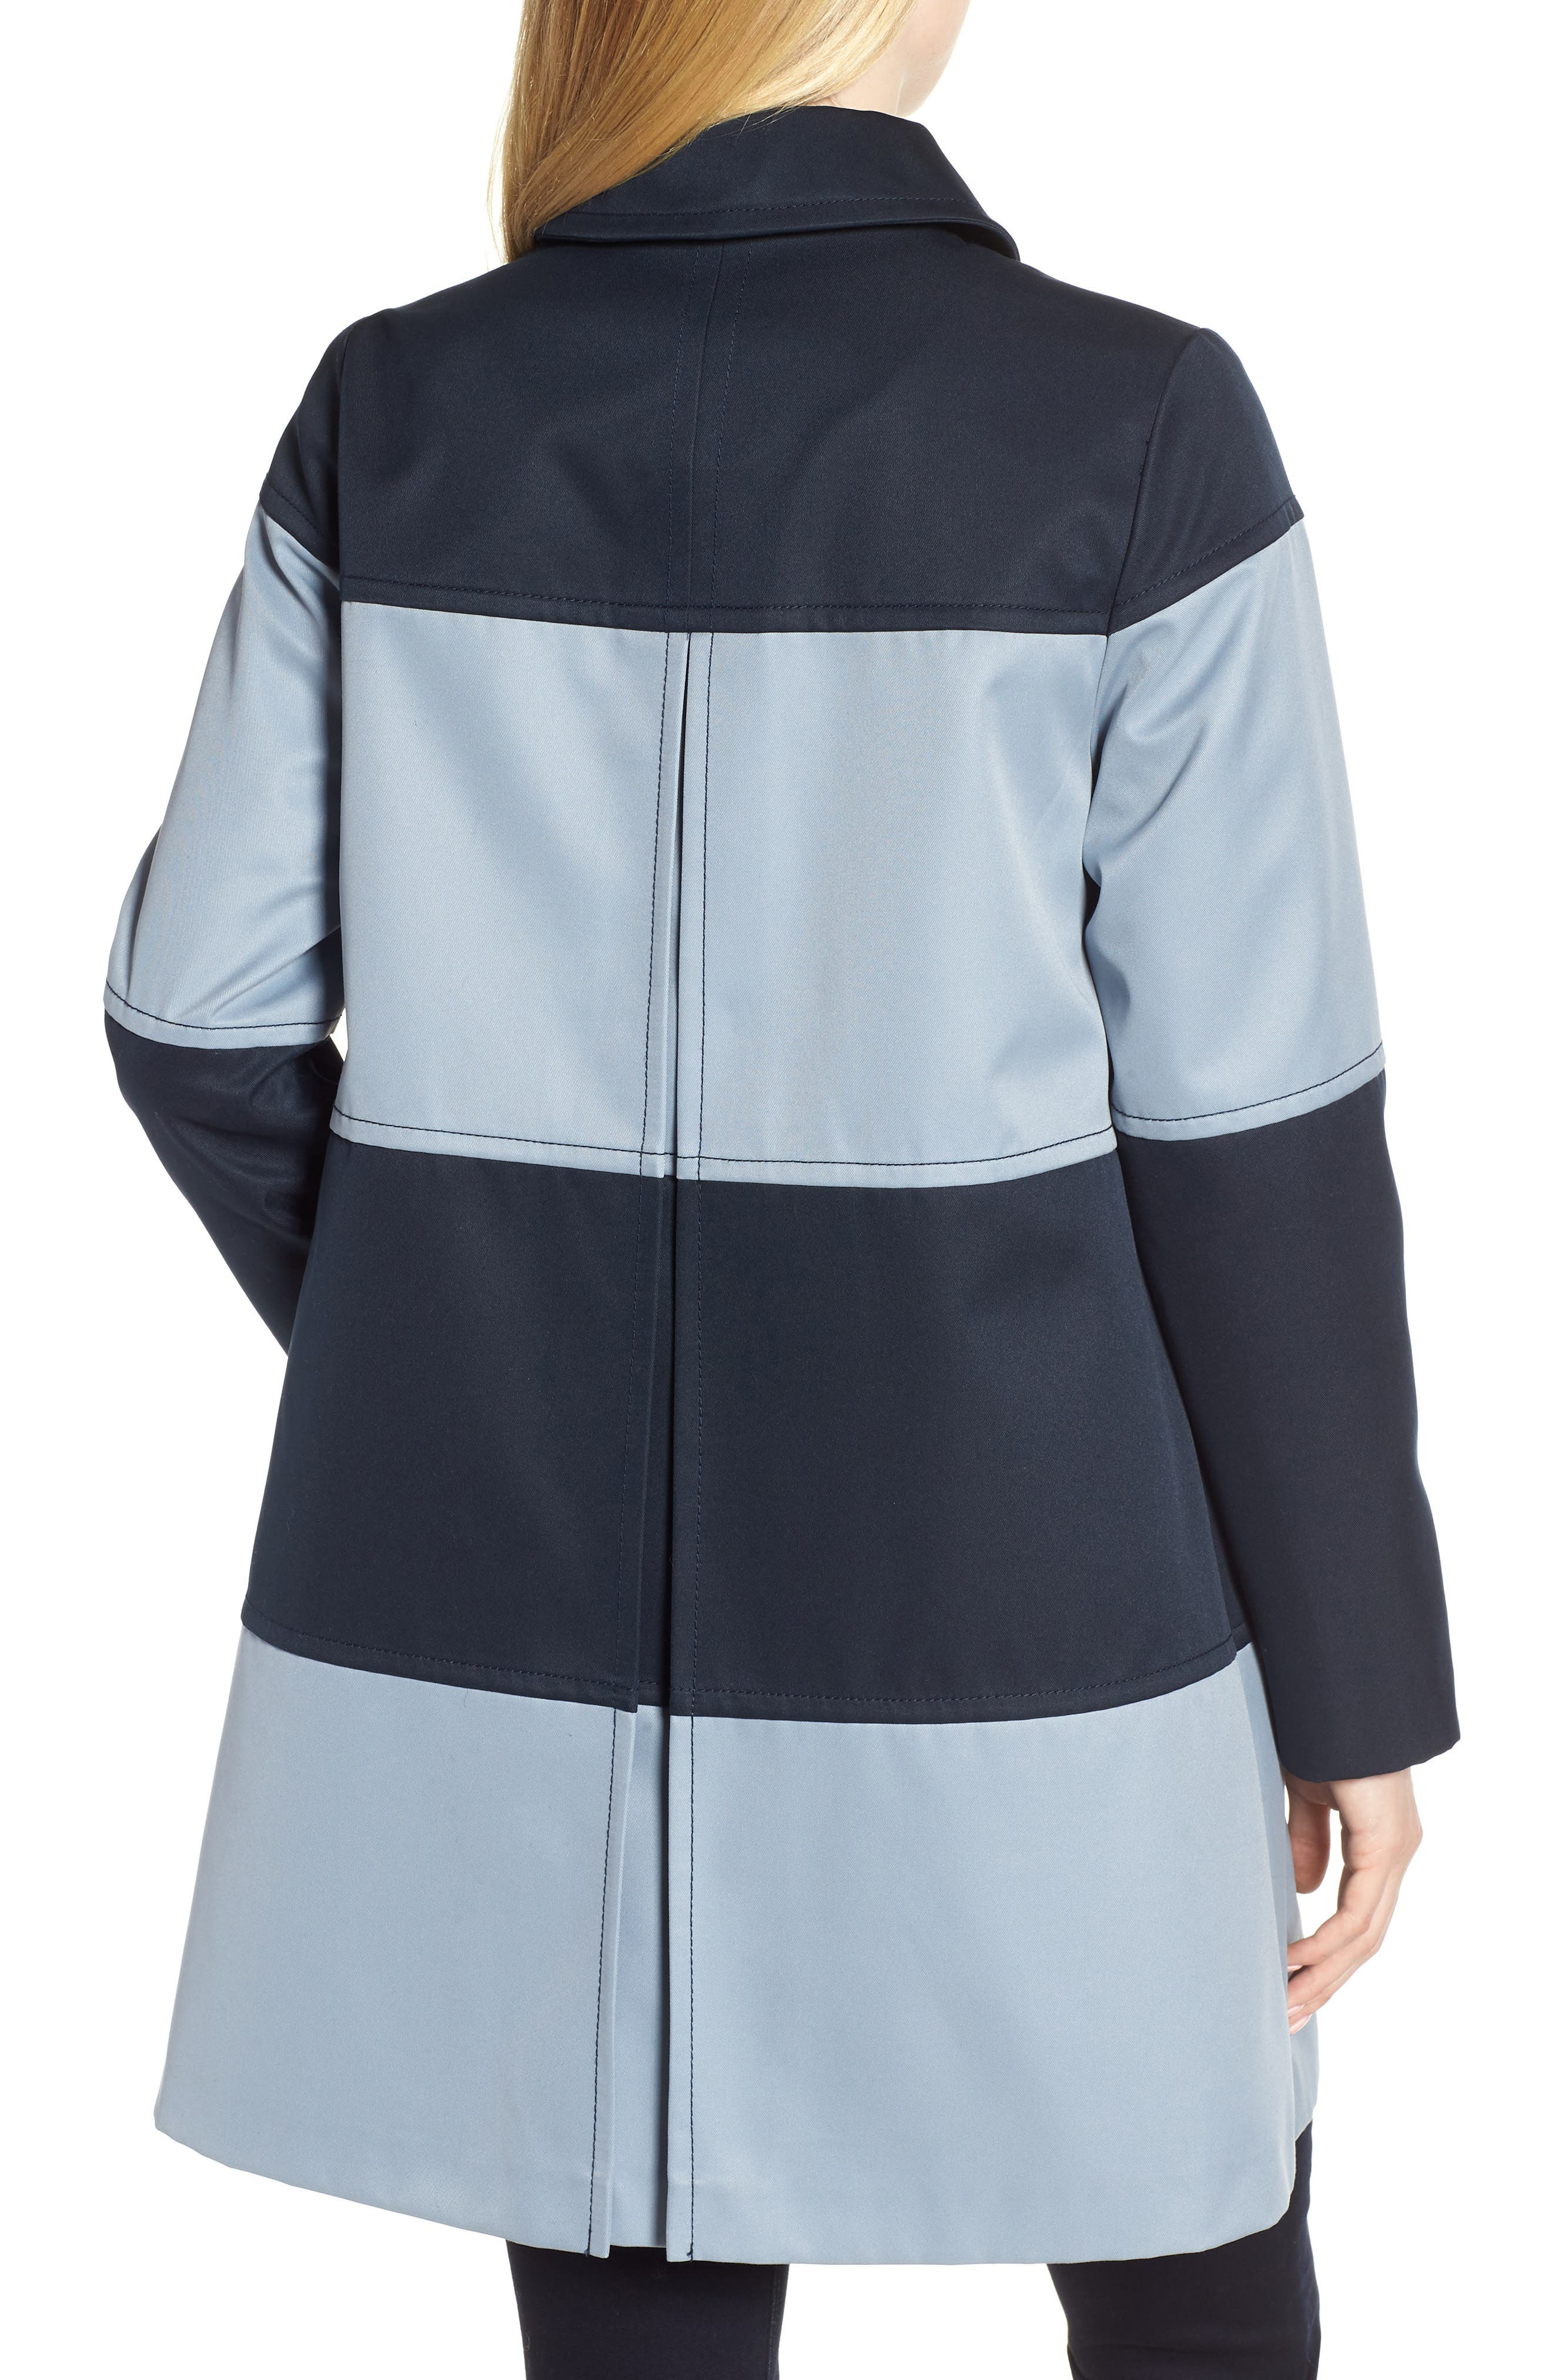 colorblock raincoat,                             Alternate thumbnail 2, color,                             400